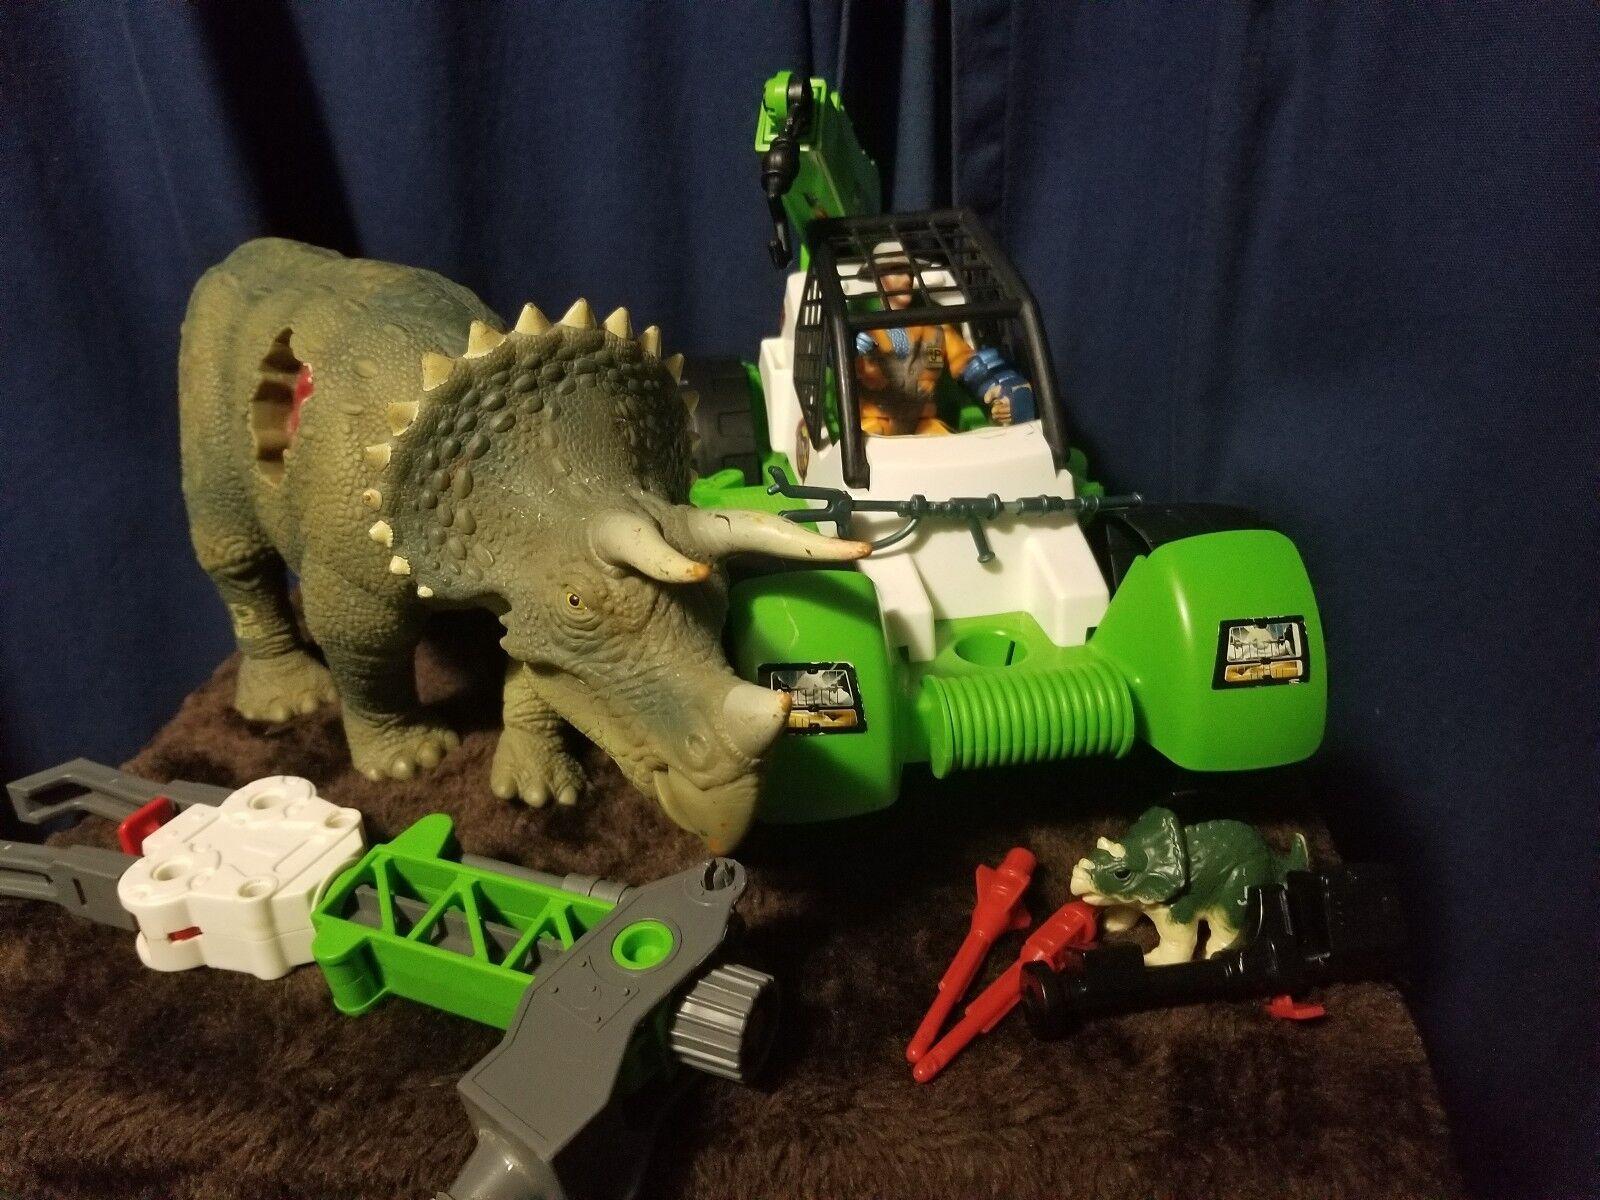 Jurassic park - chaos wirkung trike tank playset